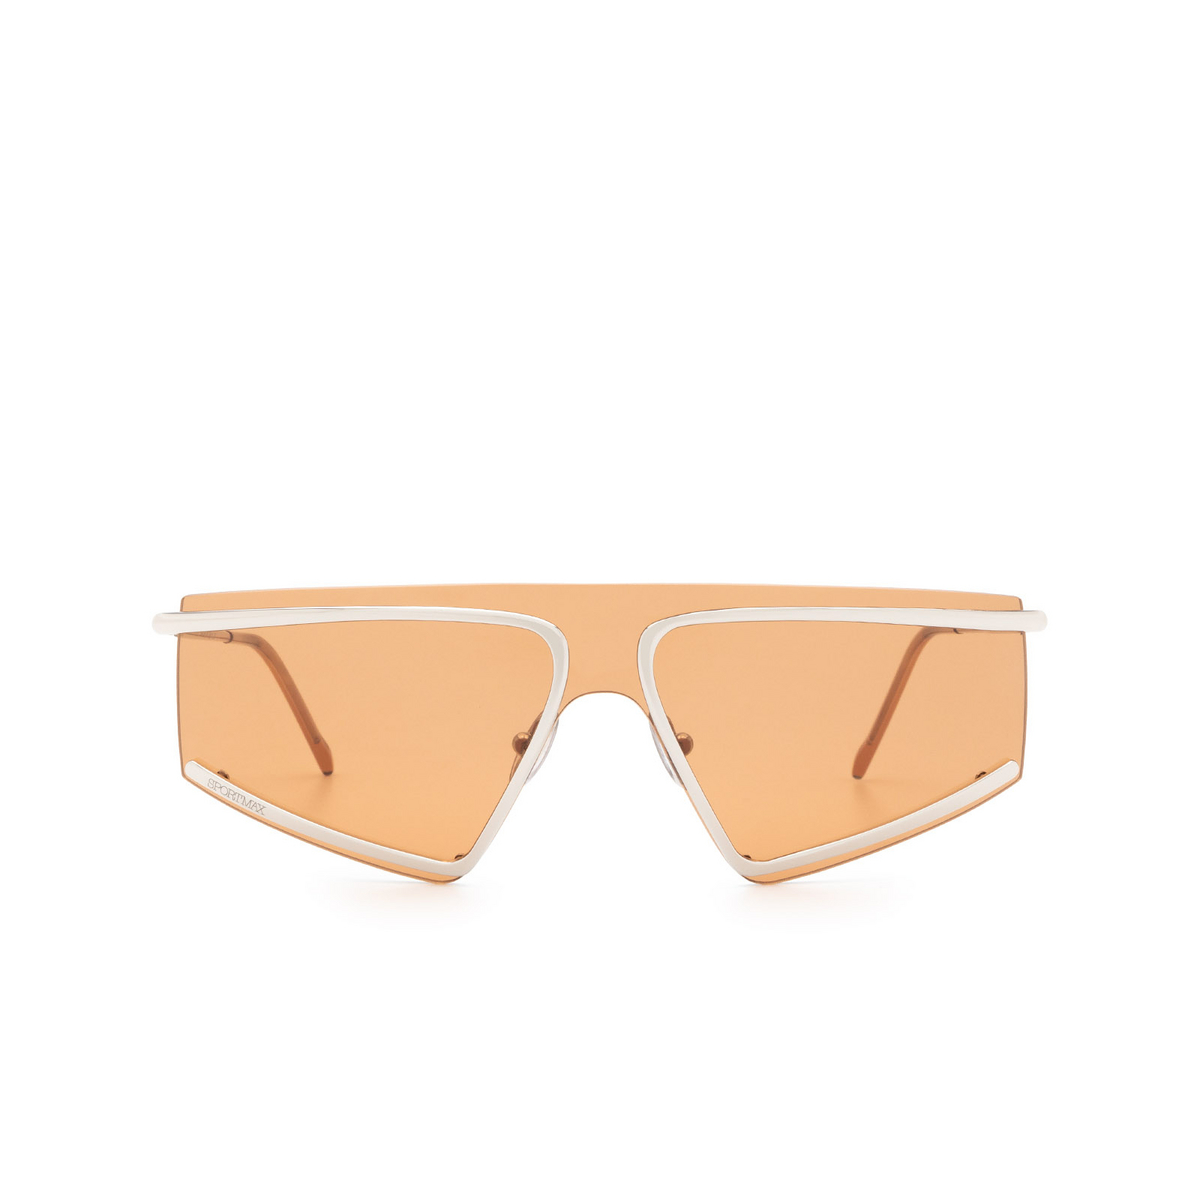 Sportmax® Mask Sunglasses: SM0023 color Shiny Palladium 16G - front view.